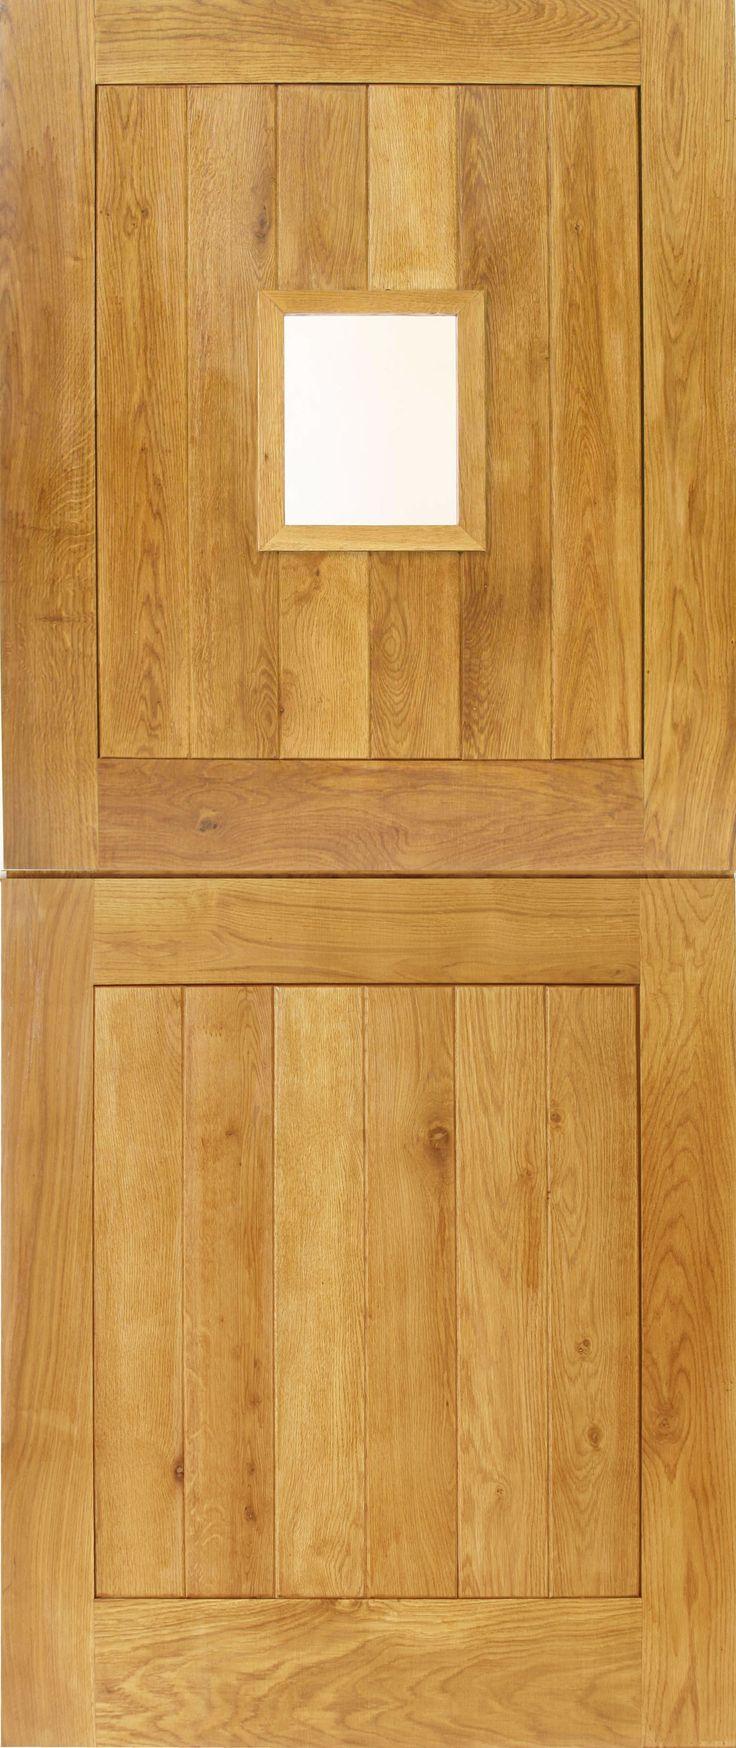 best 25 oak doors ideas on pinterest oak doors uk. Black Bedroom Furniture Sets. Home Design Ideas